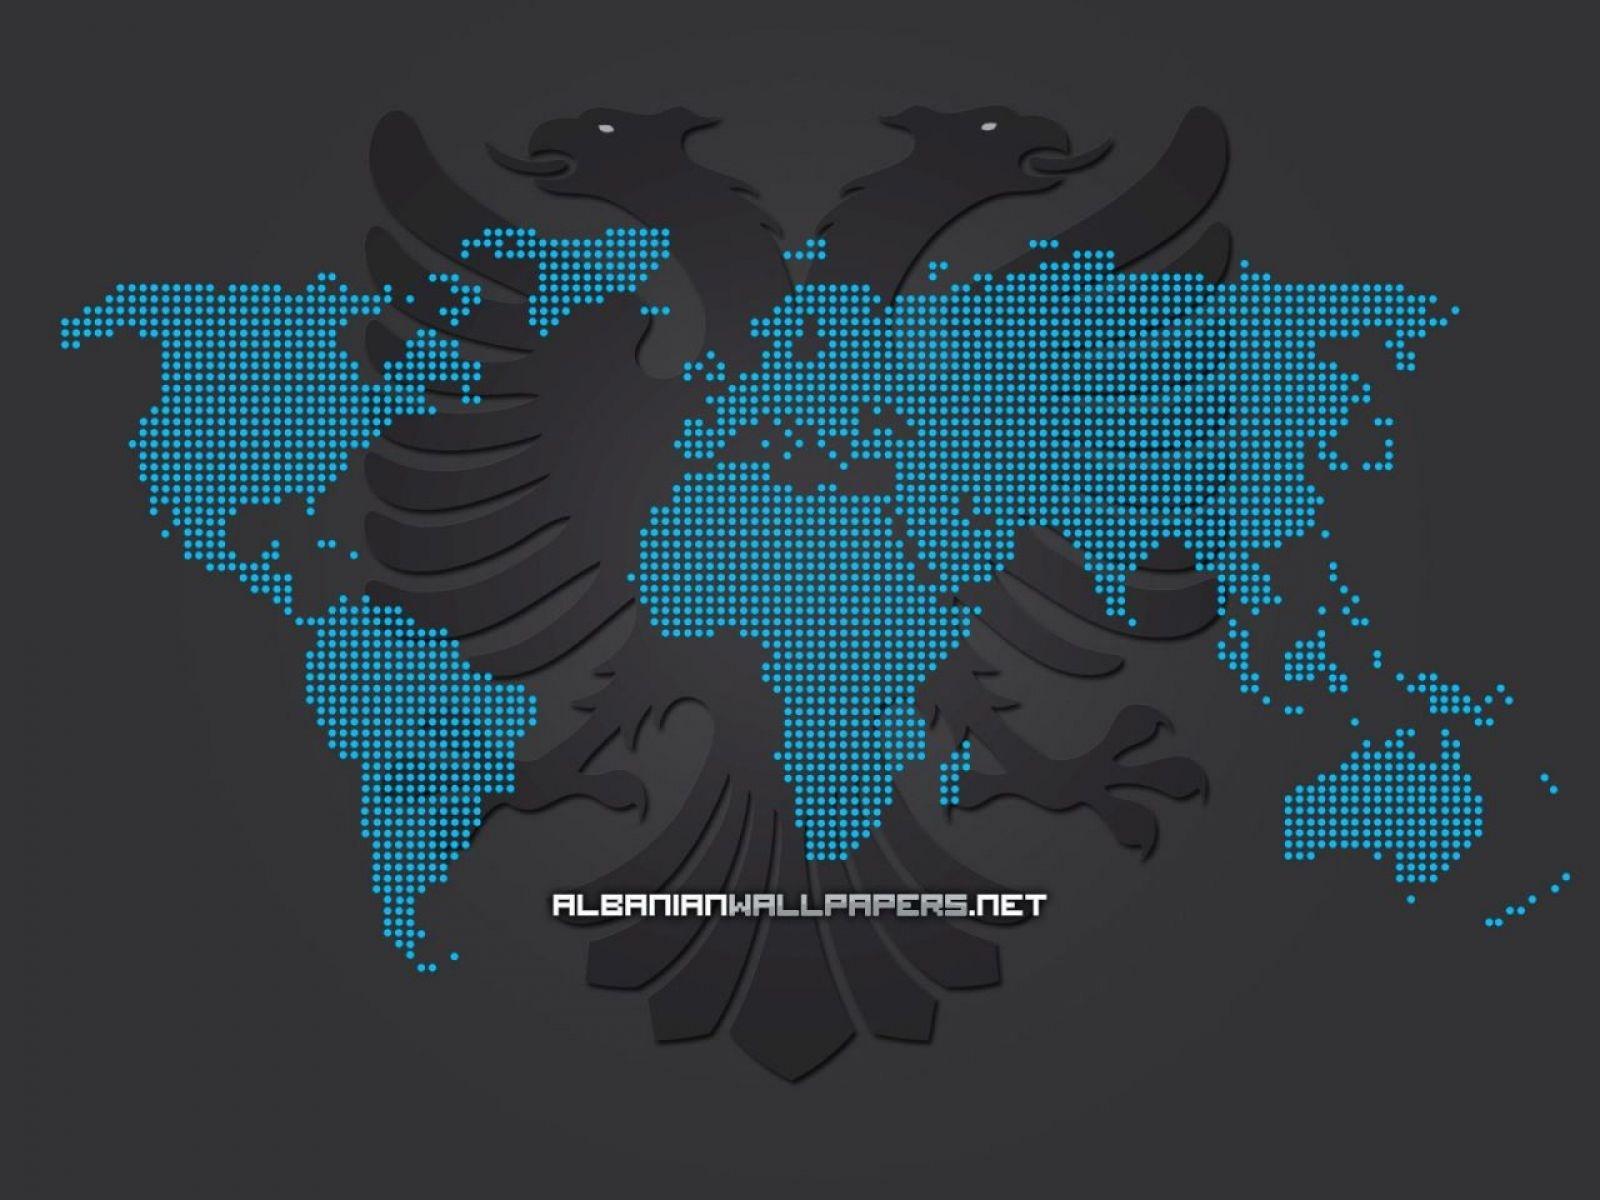 Best 56 World Domination Wallpaper on HipWallpaper Disneyworld 1600x1200